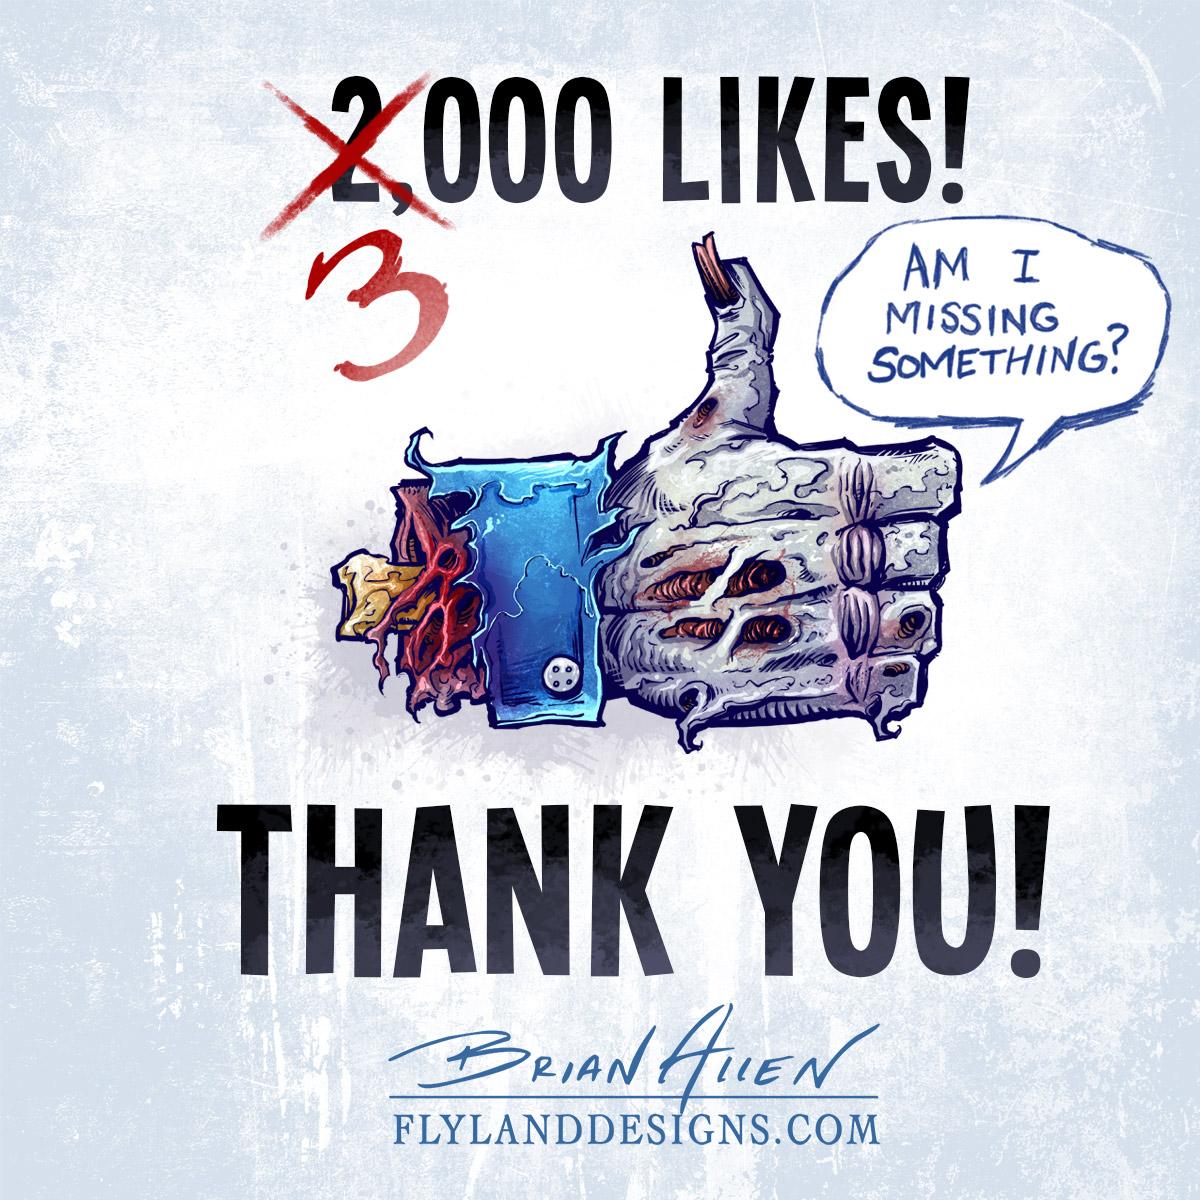 2014-07-30---3000-likes